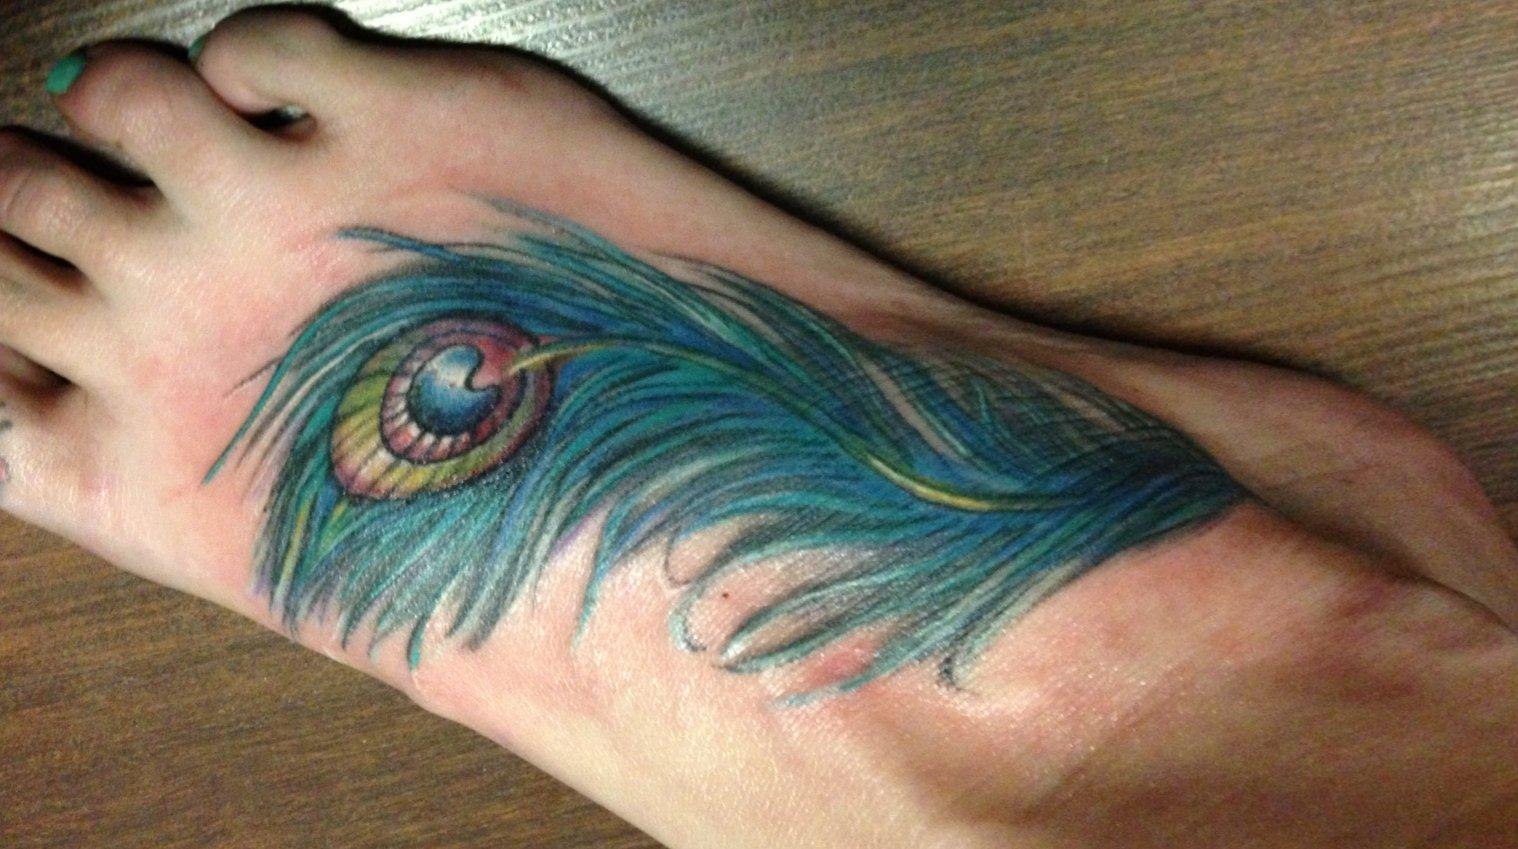 Pfau Tattoo Motive und Pfauenfeder Tattoo Bedeutung alletattoo.de 25